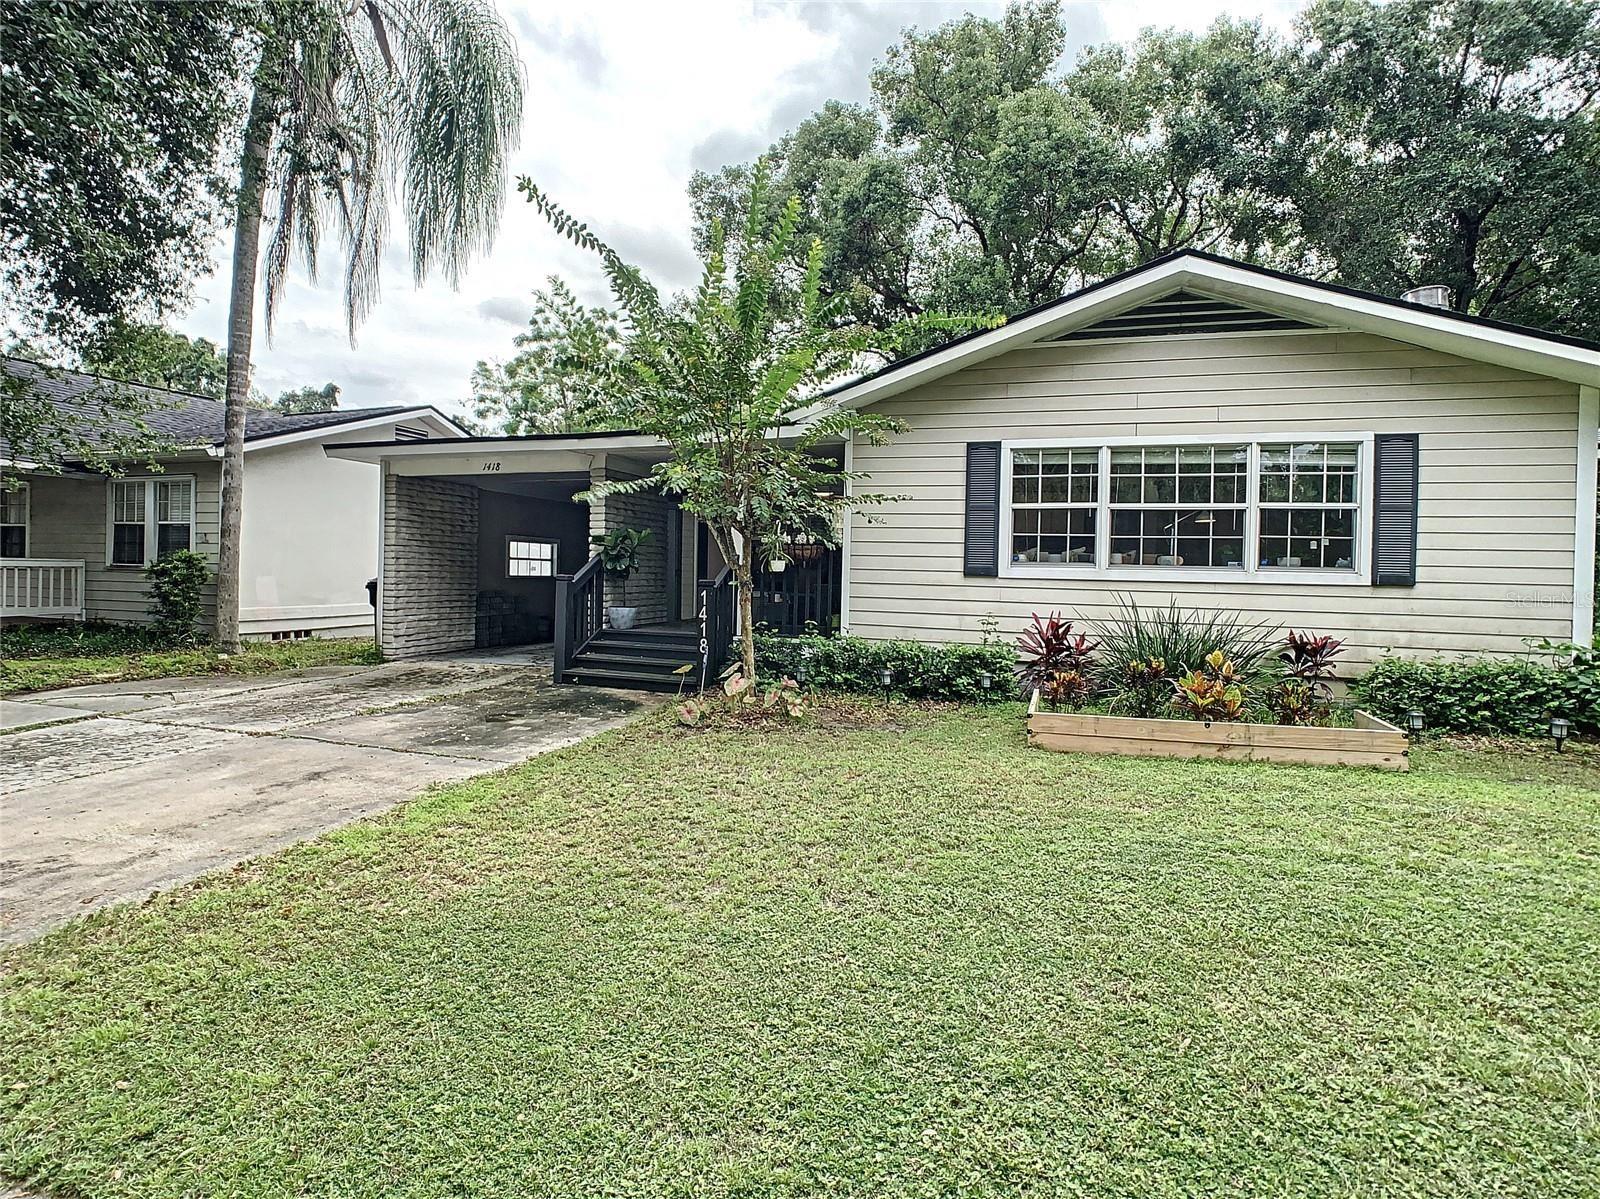 Photo of 1418 E KALEY STREET, ORLANDO, FL 32806 (MLS # S5056958)